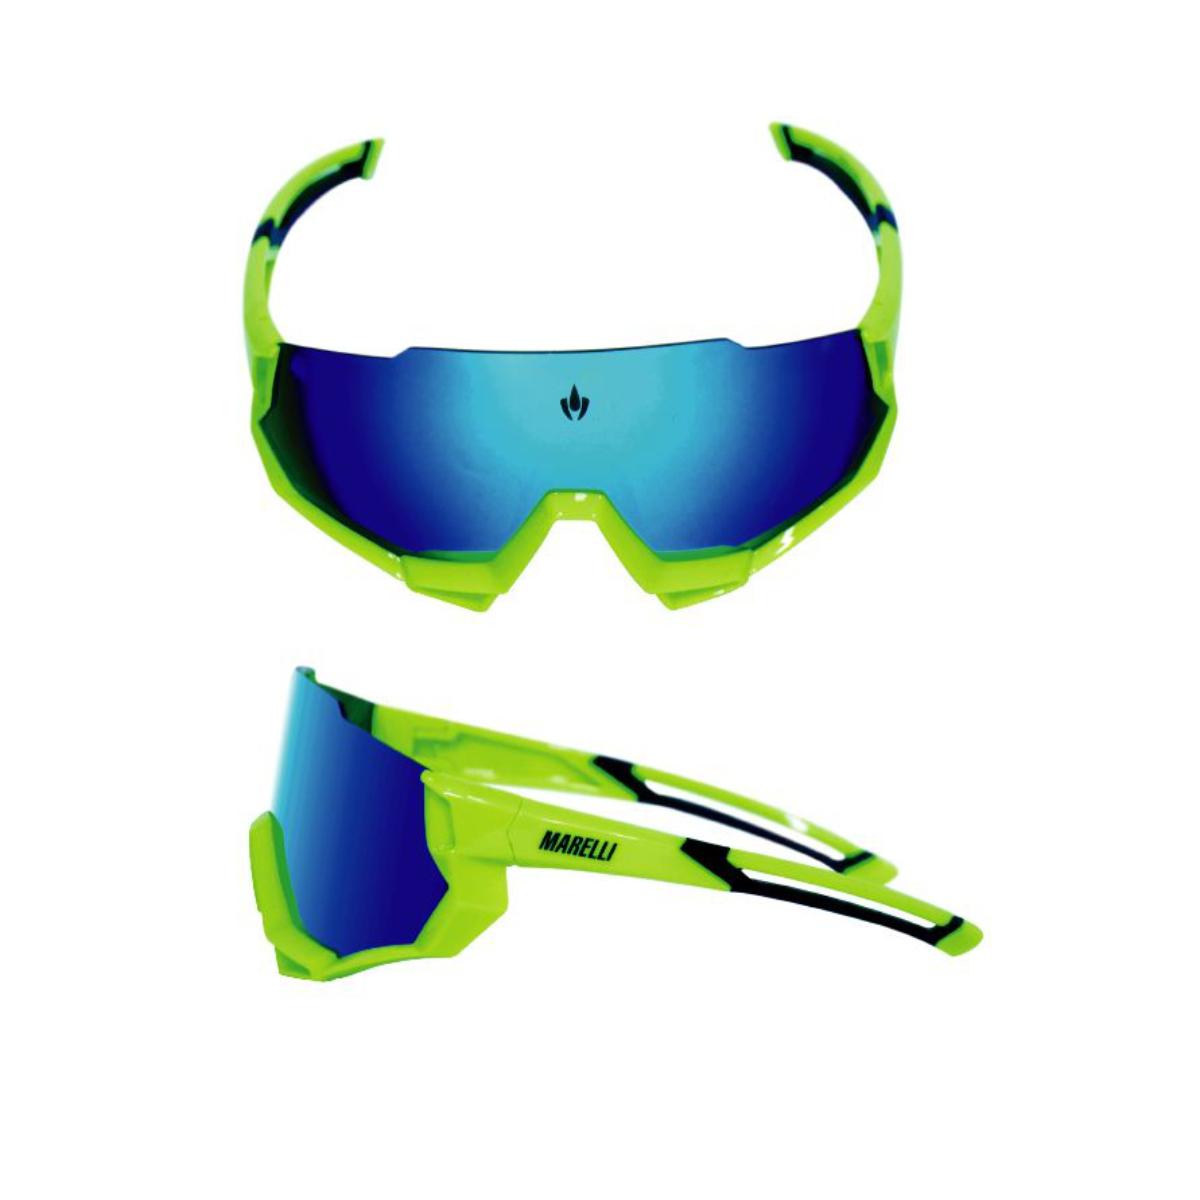 Óculos Marelli Cronos Uv400 Antirreflexo Mtb Ciclismo Bike